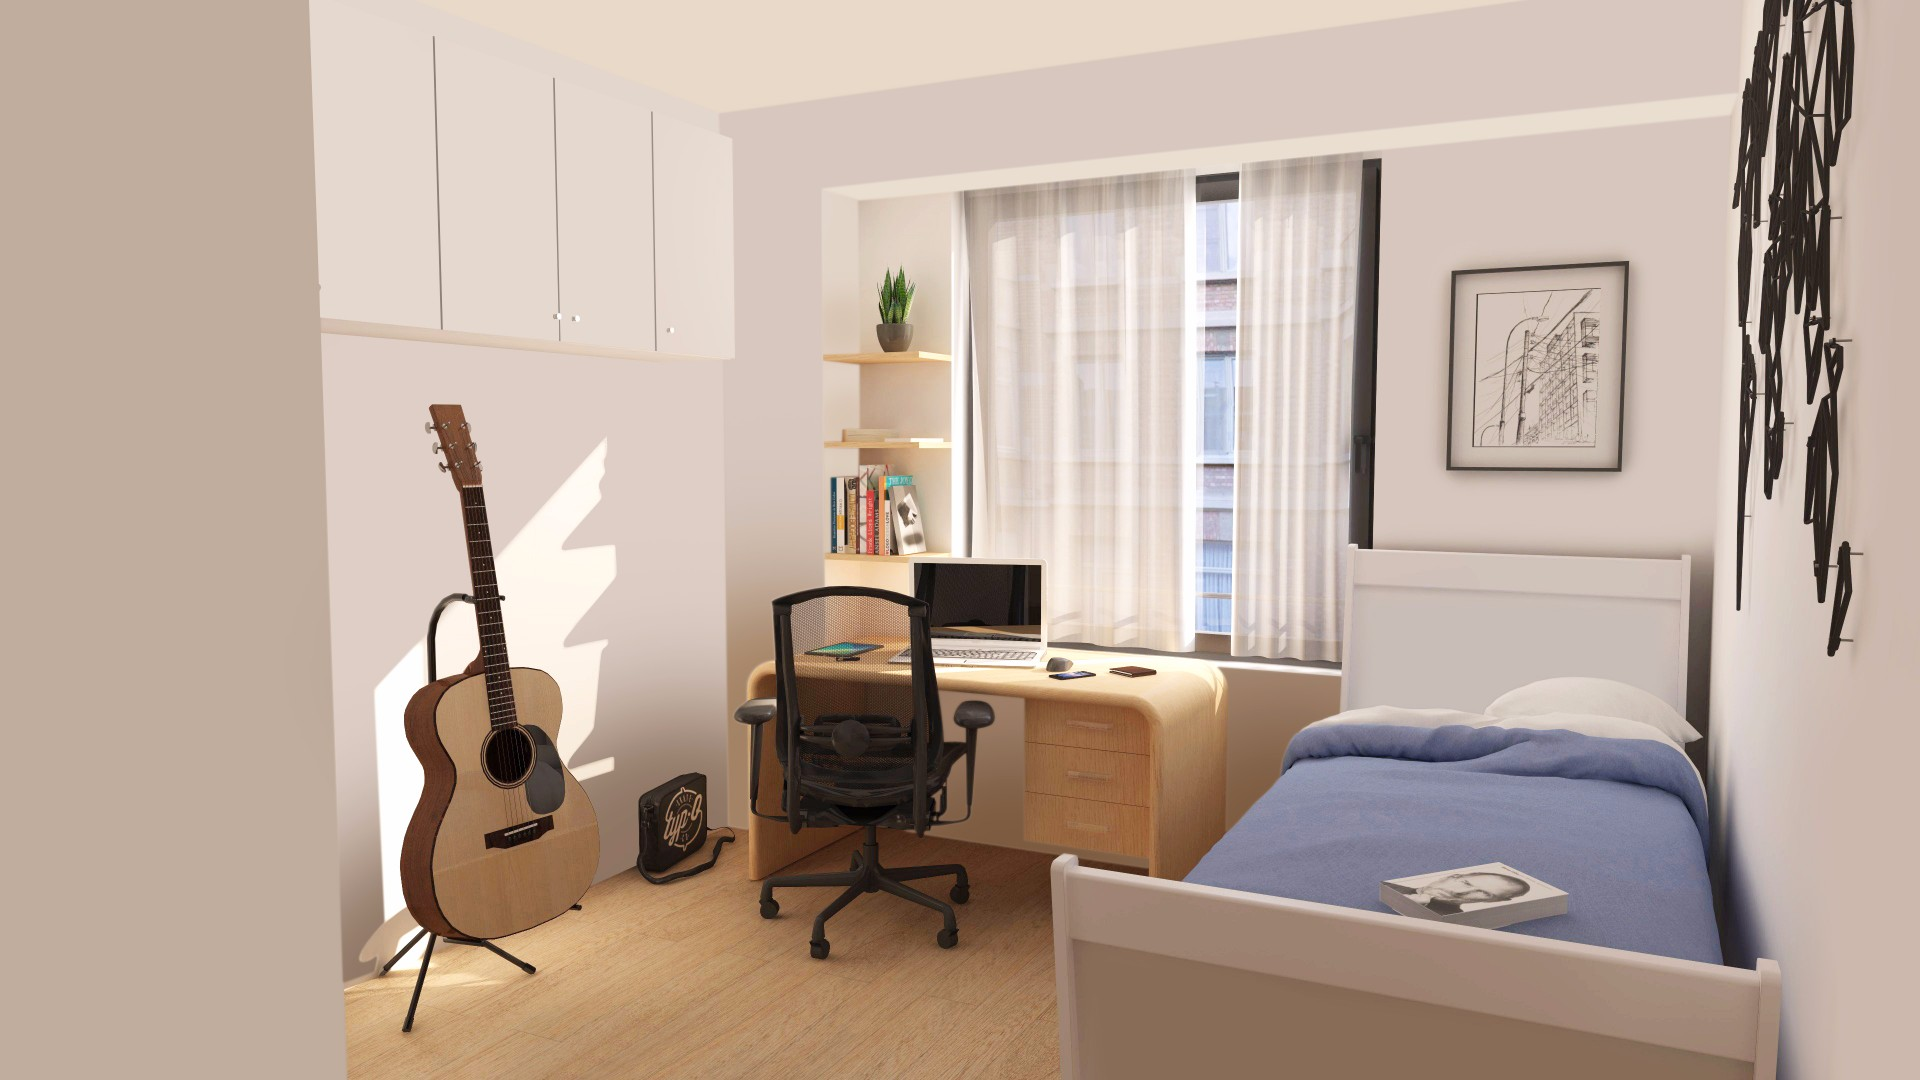 Residentie Lambertus_interieur_5.jpg